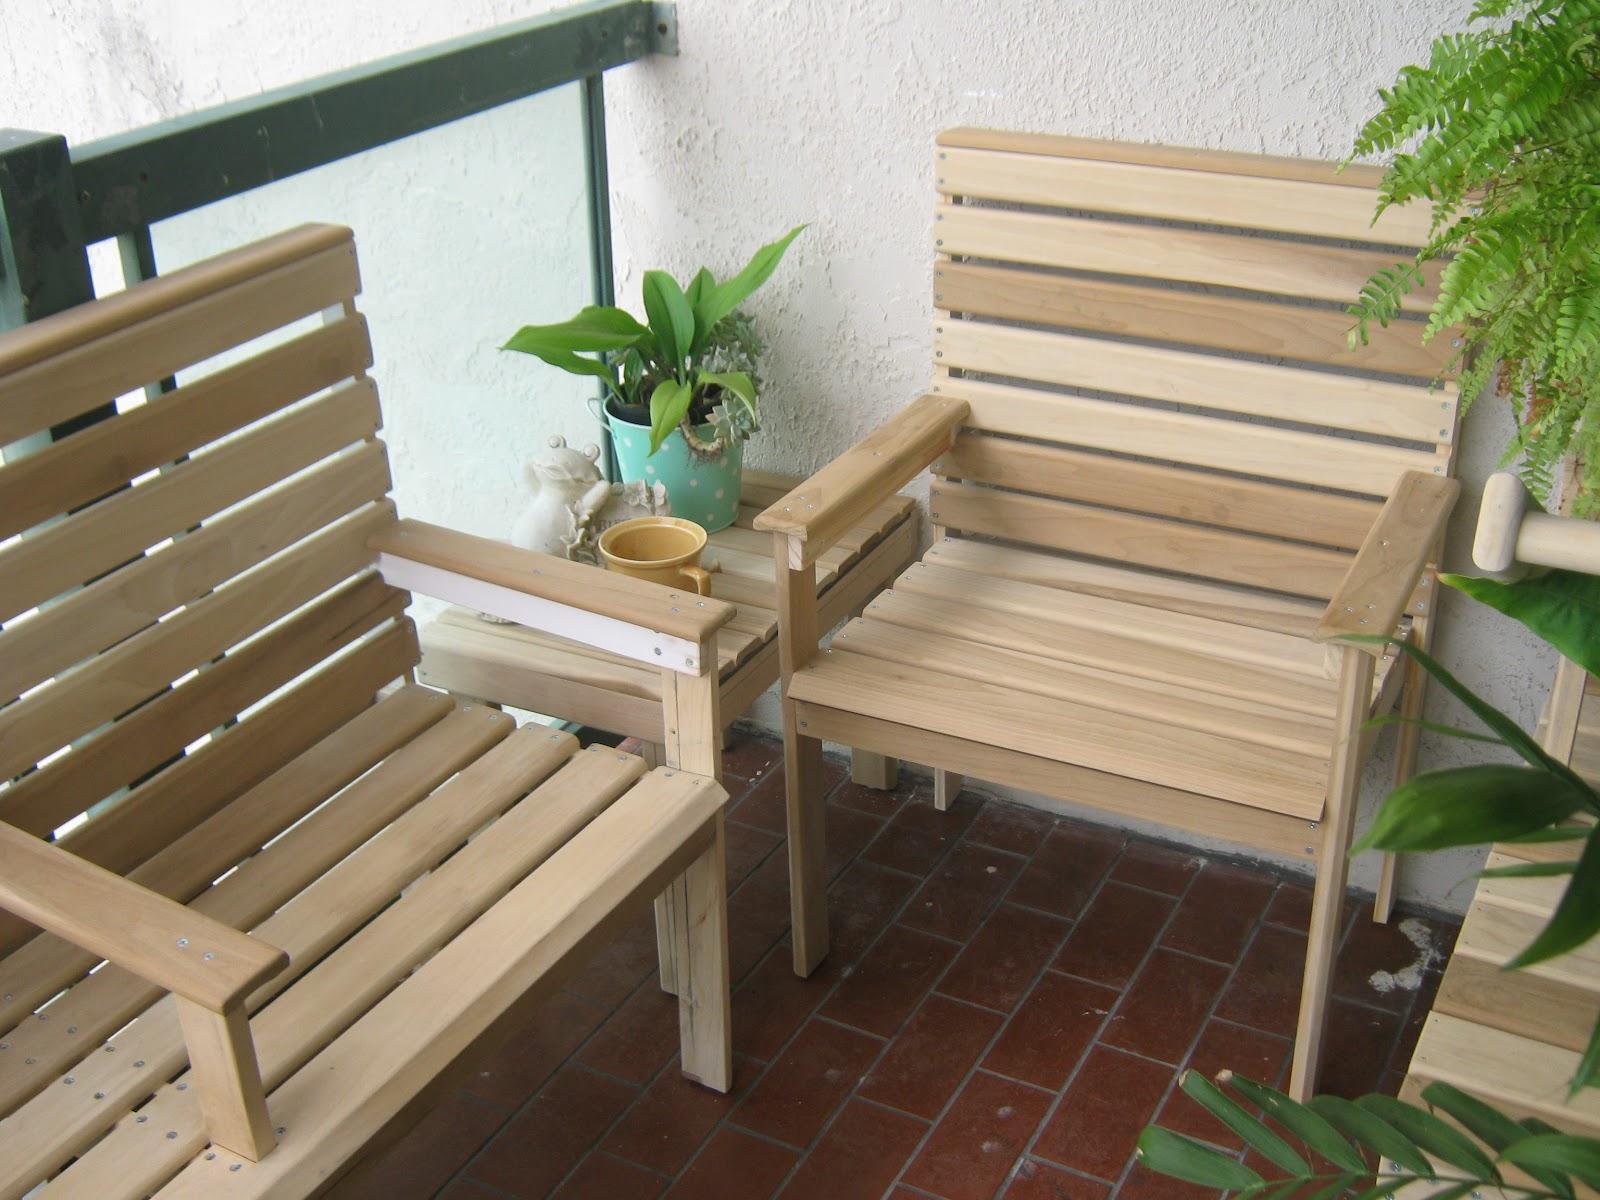 Fernandez cabinet muebles en madera para balcon o for Muebles para balcon